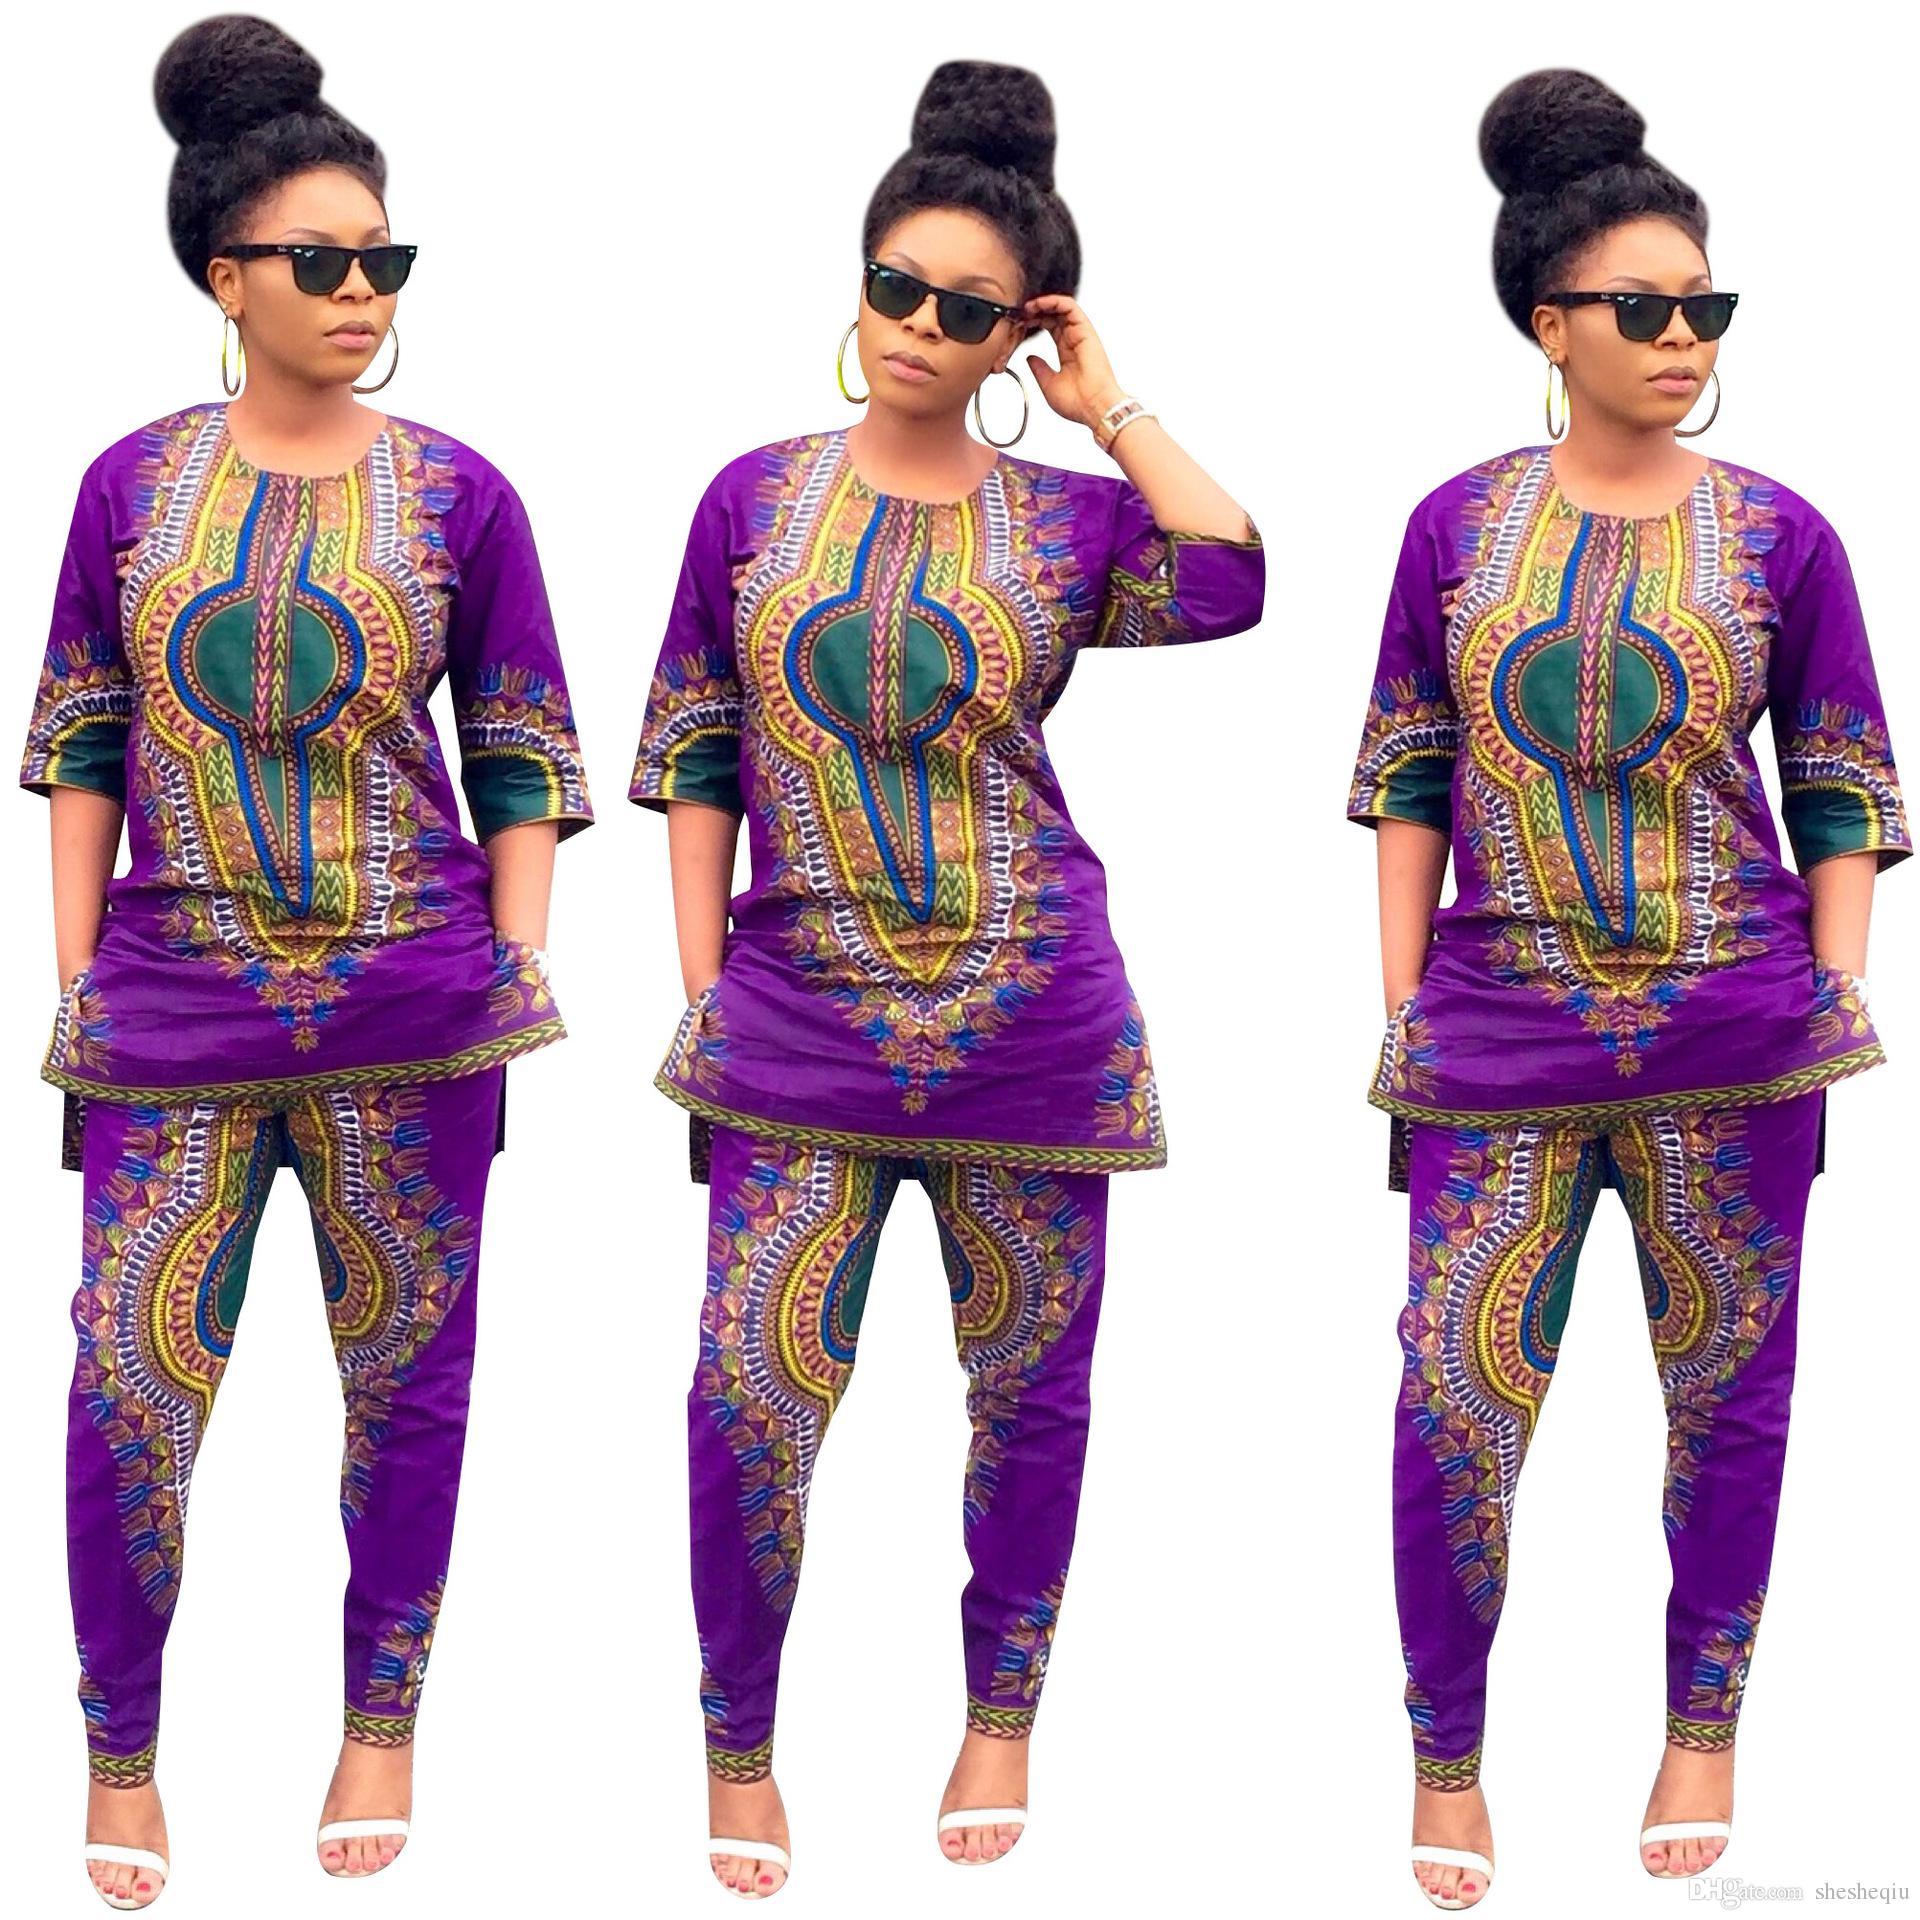 885d6d0aef8 spring autumn summer 2016 African dresses for women dashiki wax batik  printing cotton 2 pieces short sleeve coat+long pants suit F01